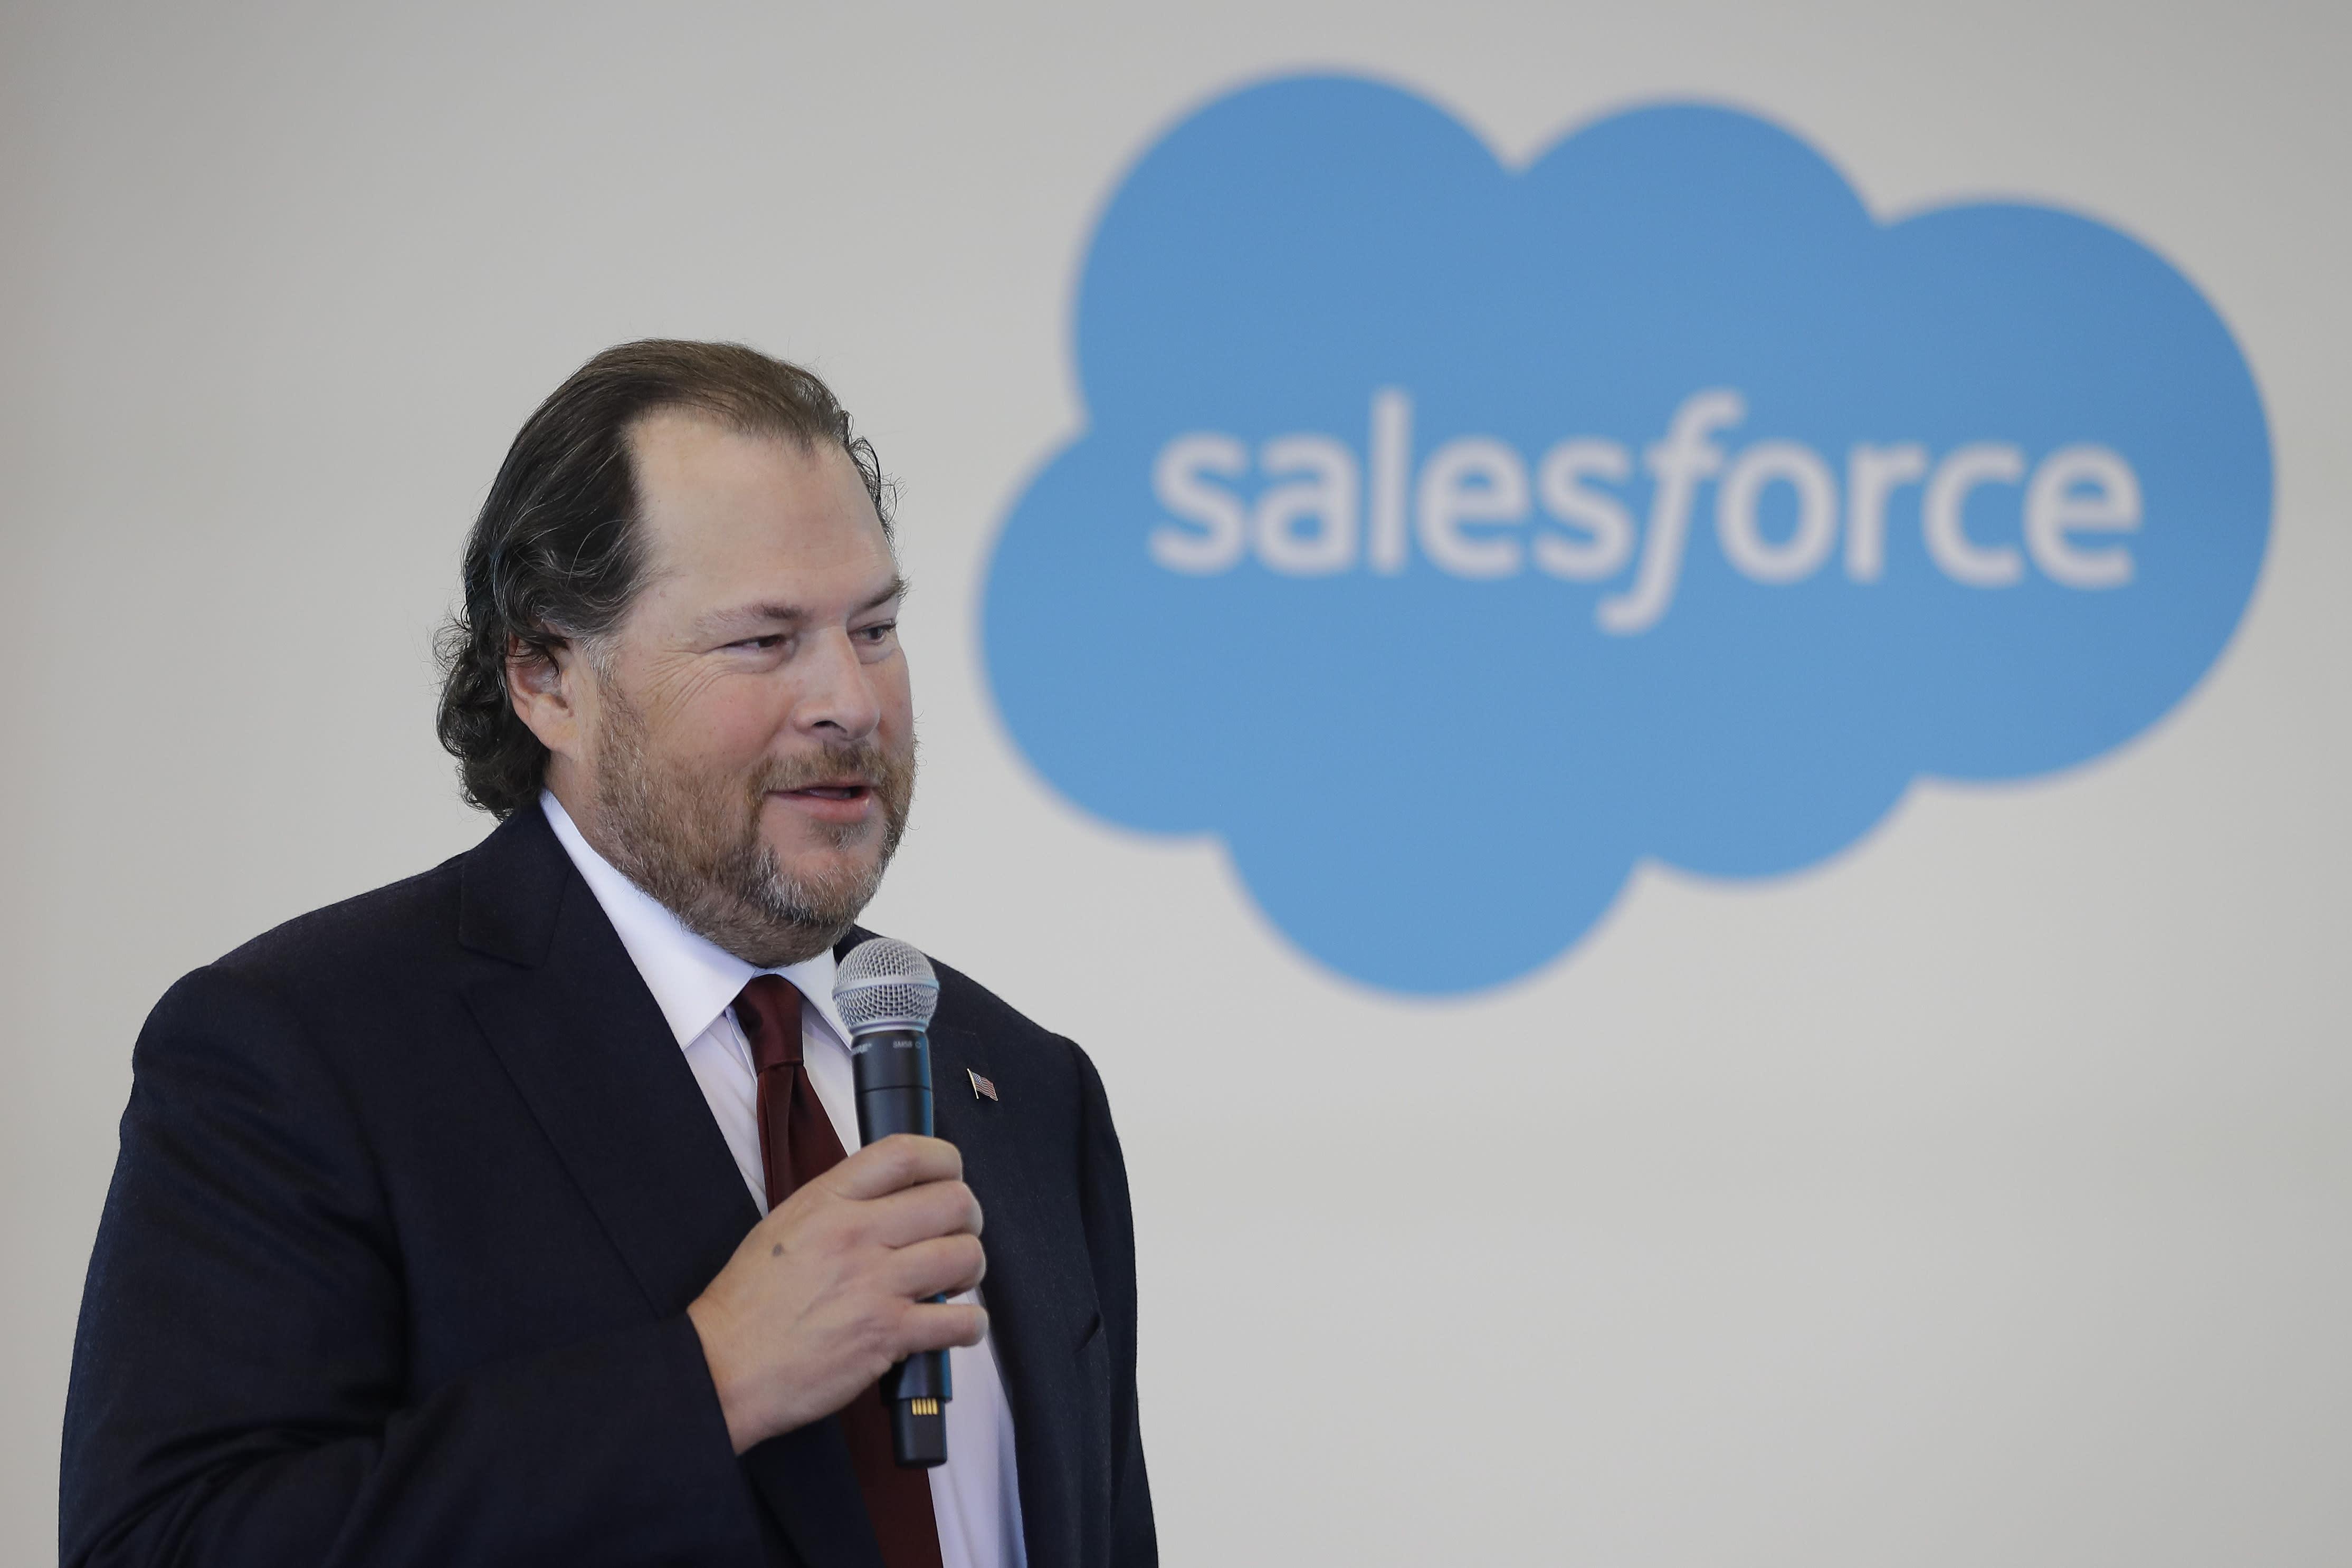 Salesforce's Marc Benioff backs higher taxes, renews critique of capitalism